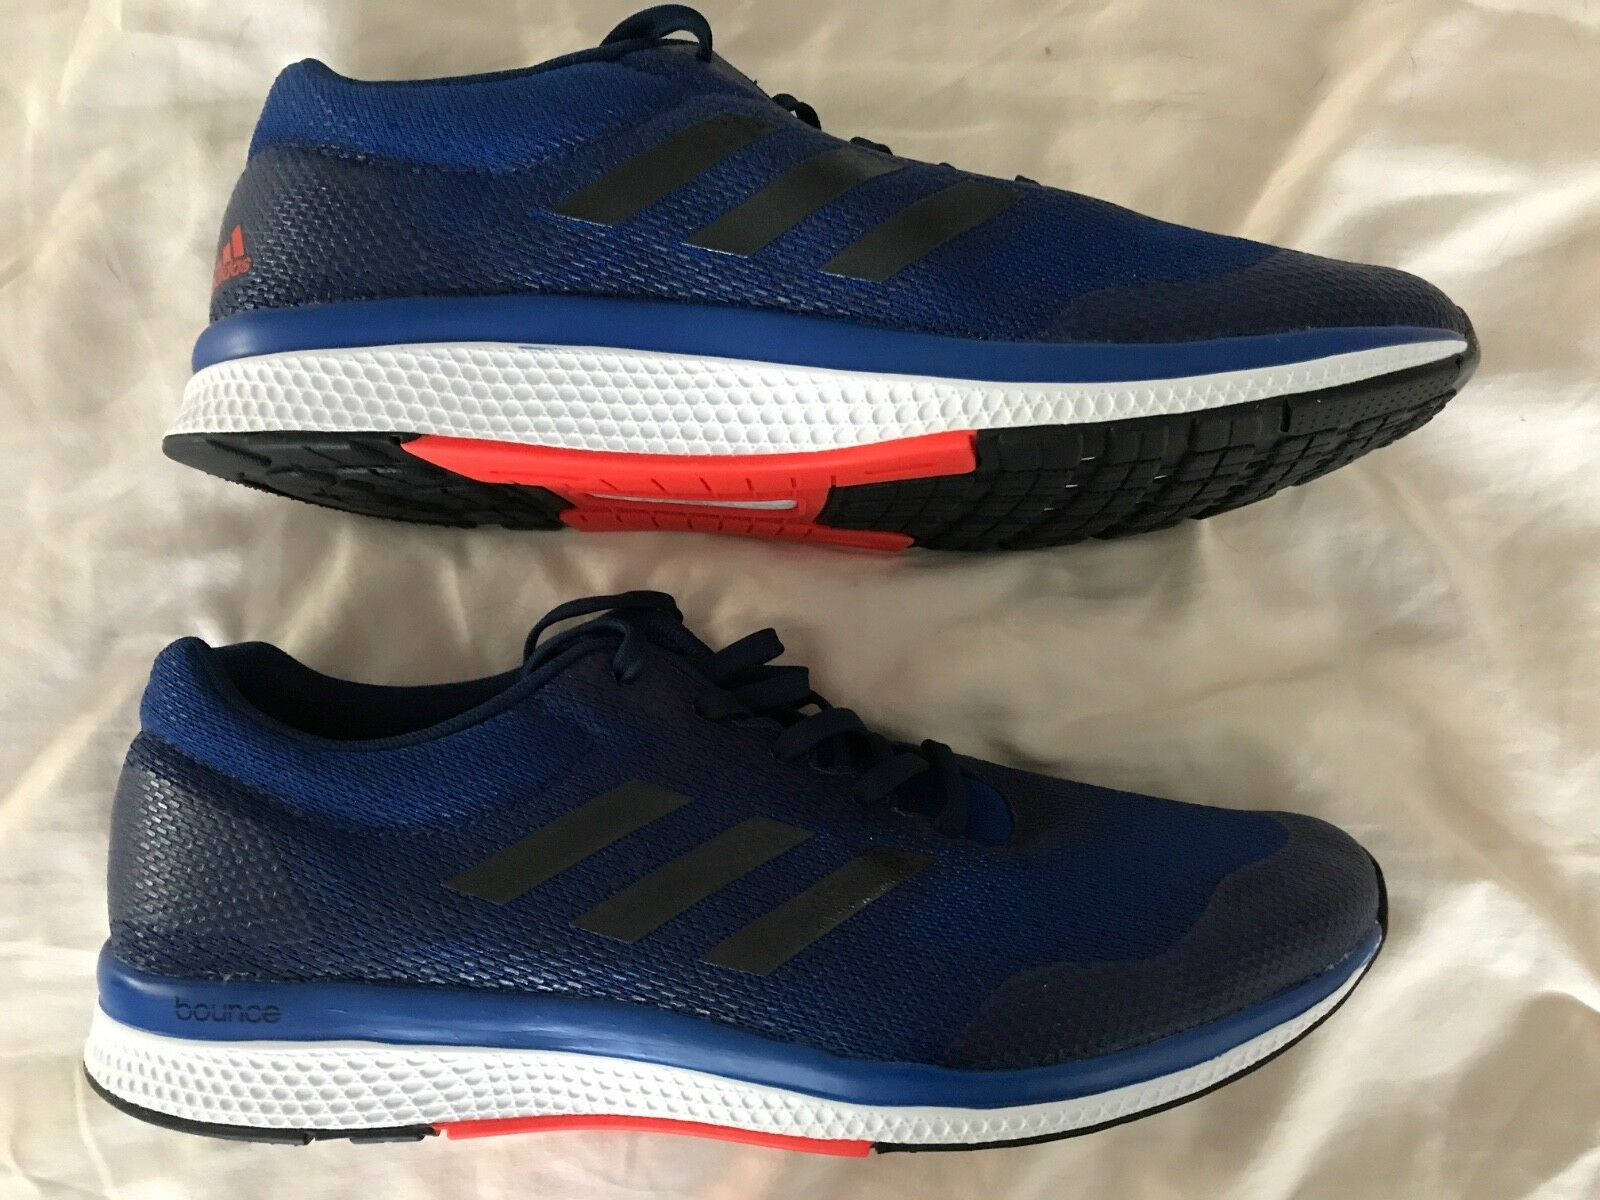 adidas blau Performance Laufschuhe Sneakers Mana Bounce 2 m Aramis blau adidas Gr. 46 US 12 8236e3